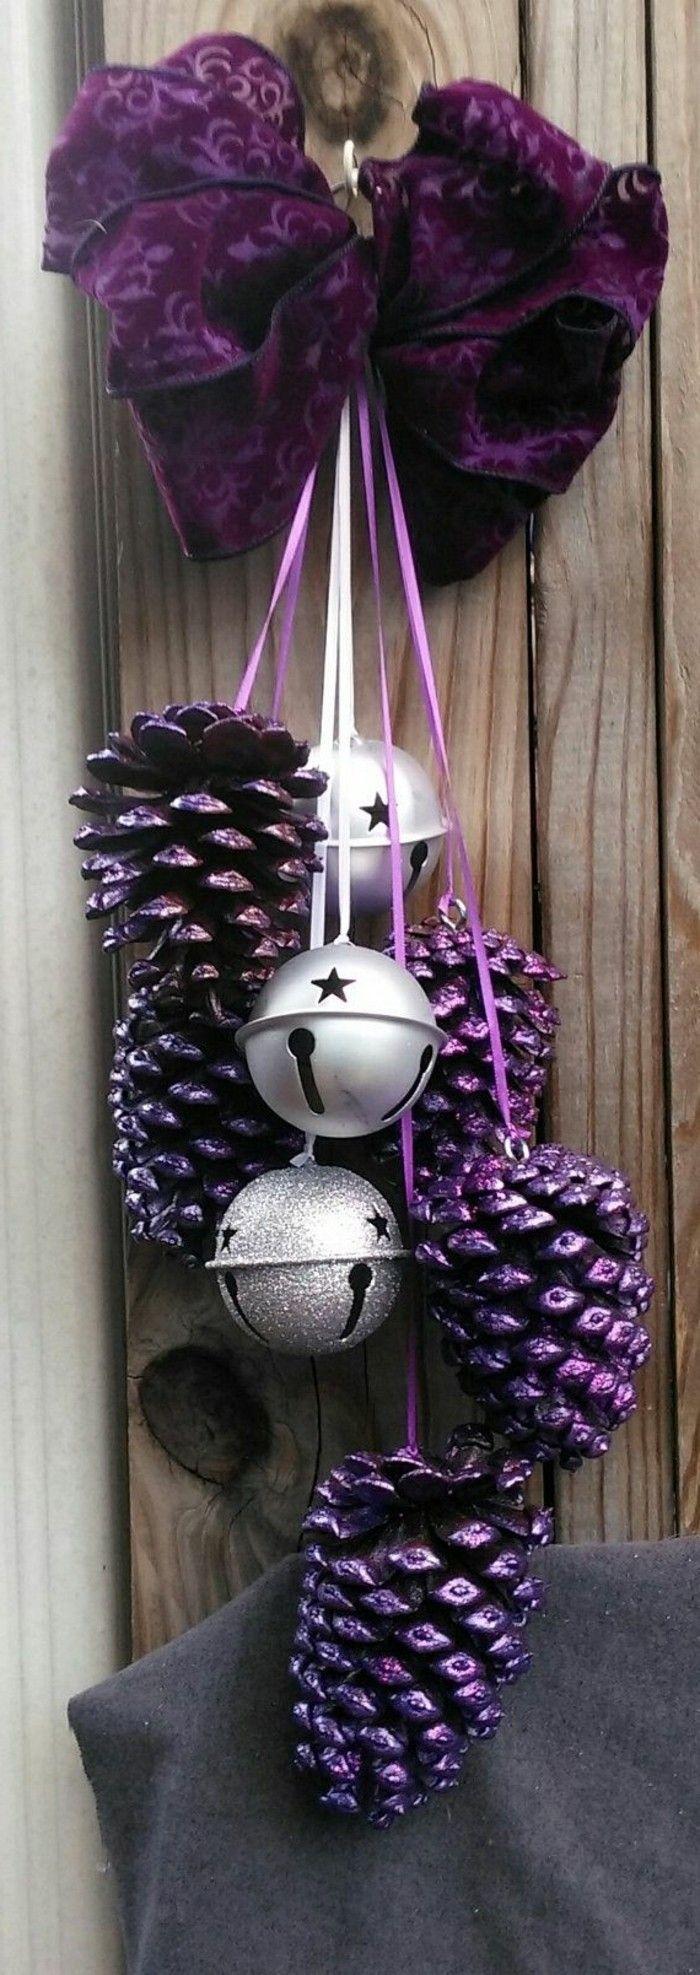 Diy deko 30 herbstliche deko ideen mit zapfen basteln decoratii de craciun pinterest - Weihnachtsdeko lila ...